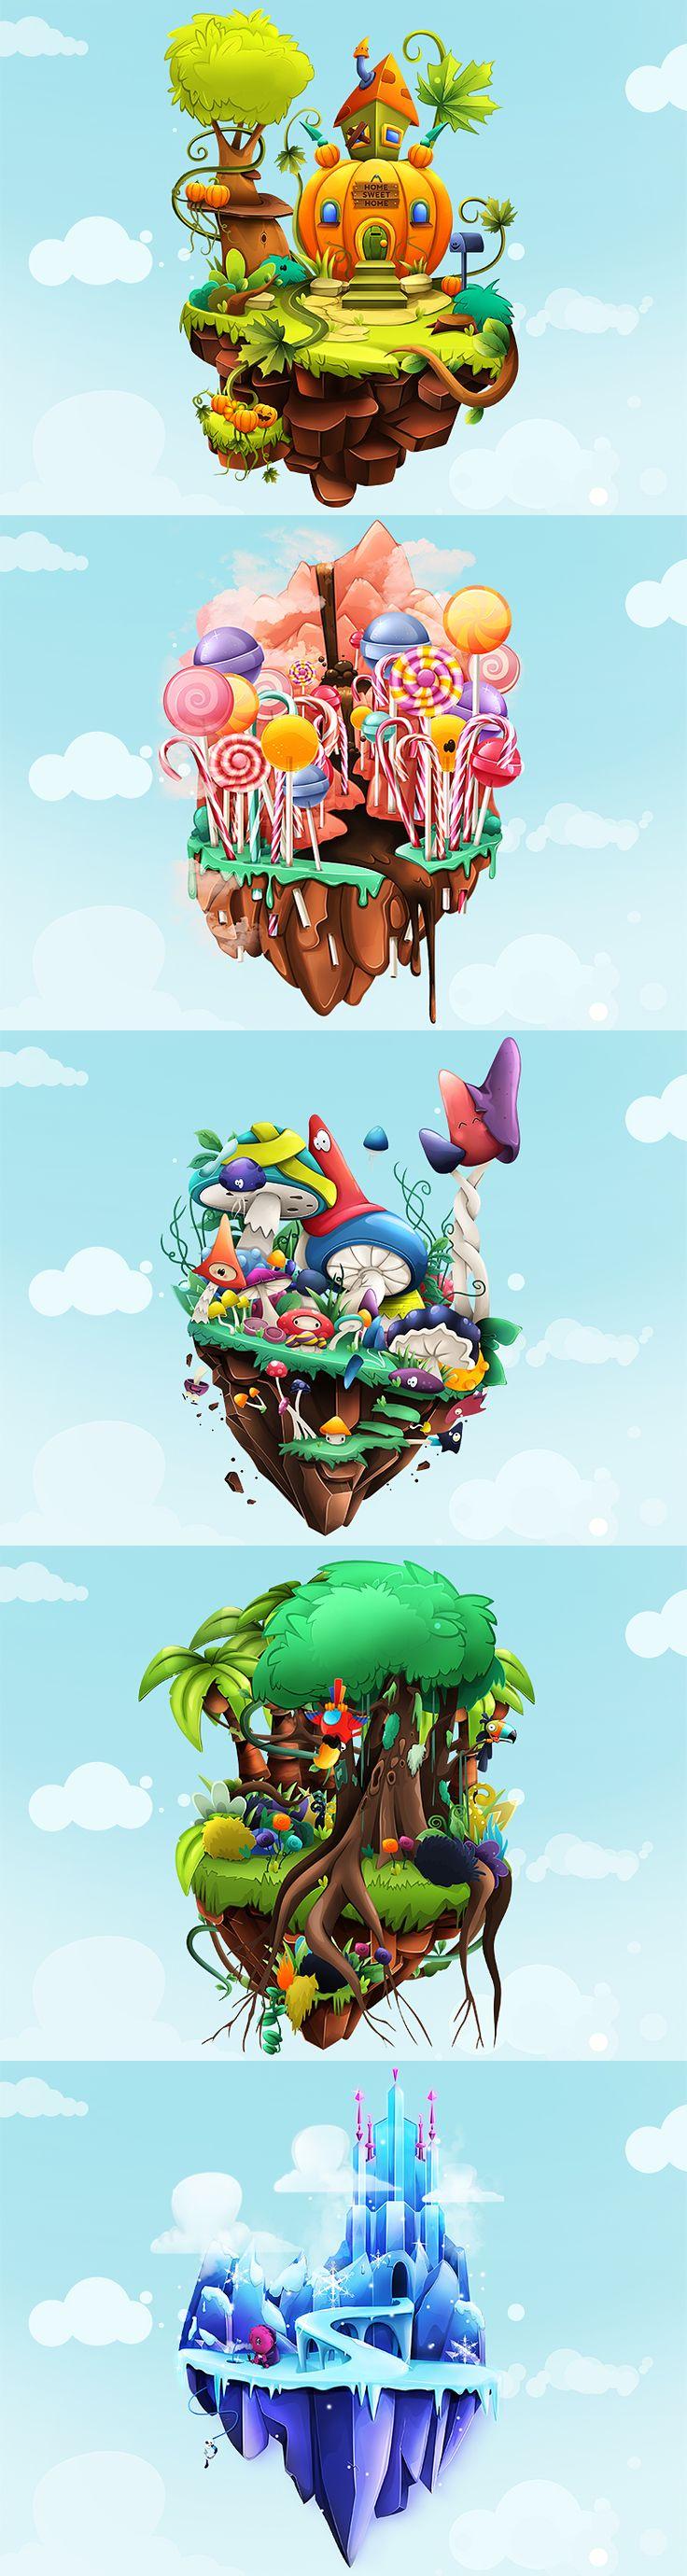 Dribbble - Floating_Islands2.jpg by Andra Popovici